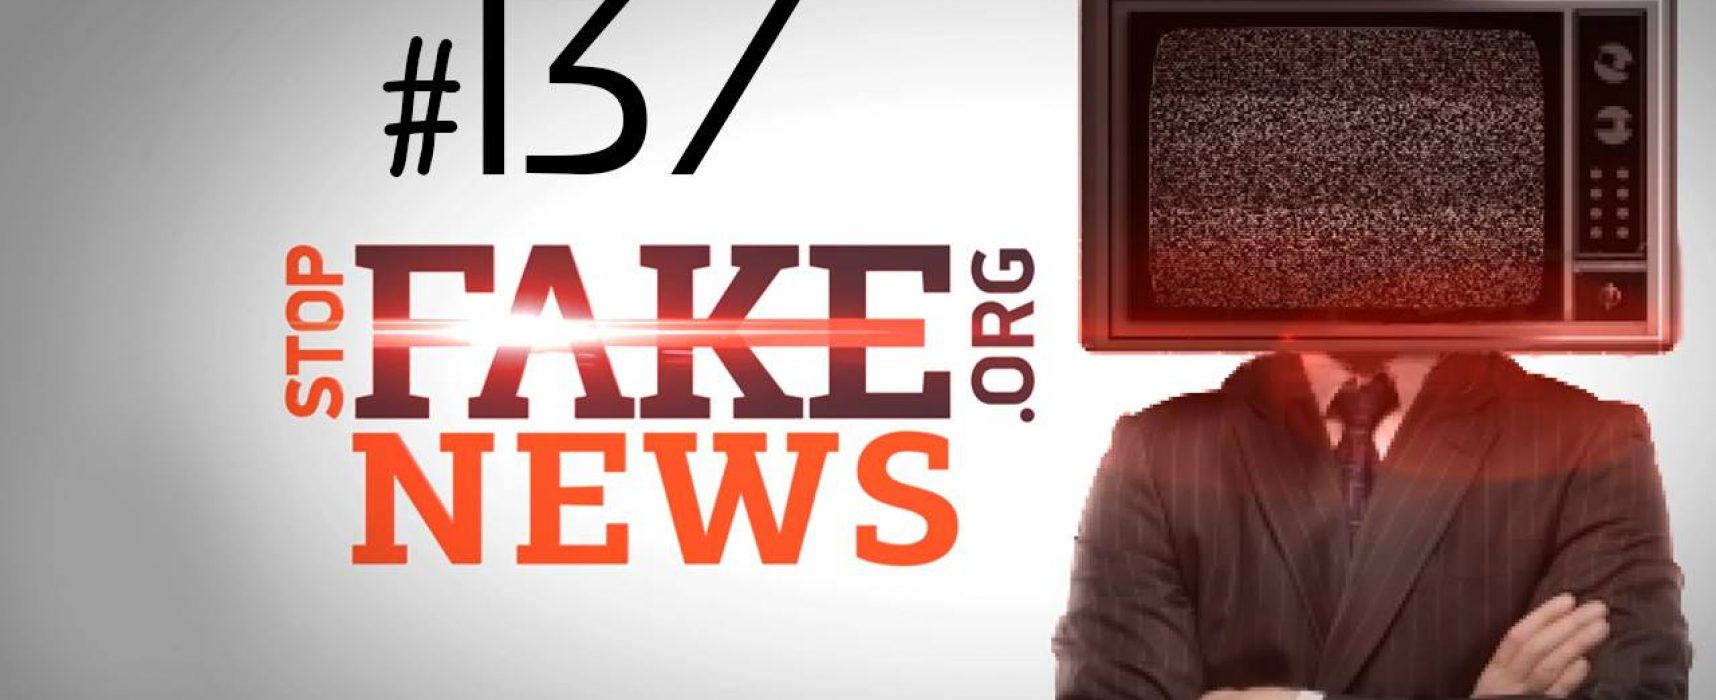 StopFakeNews #137. Как врал Янукович на пресс-конференции в Ростове